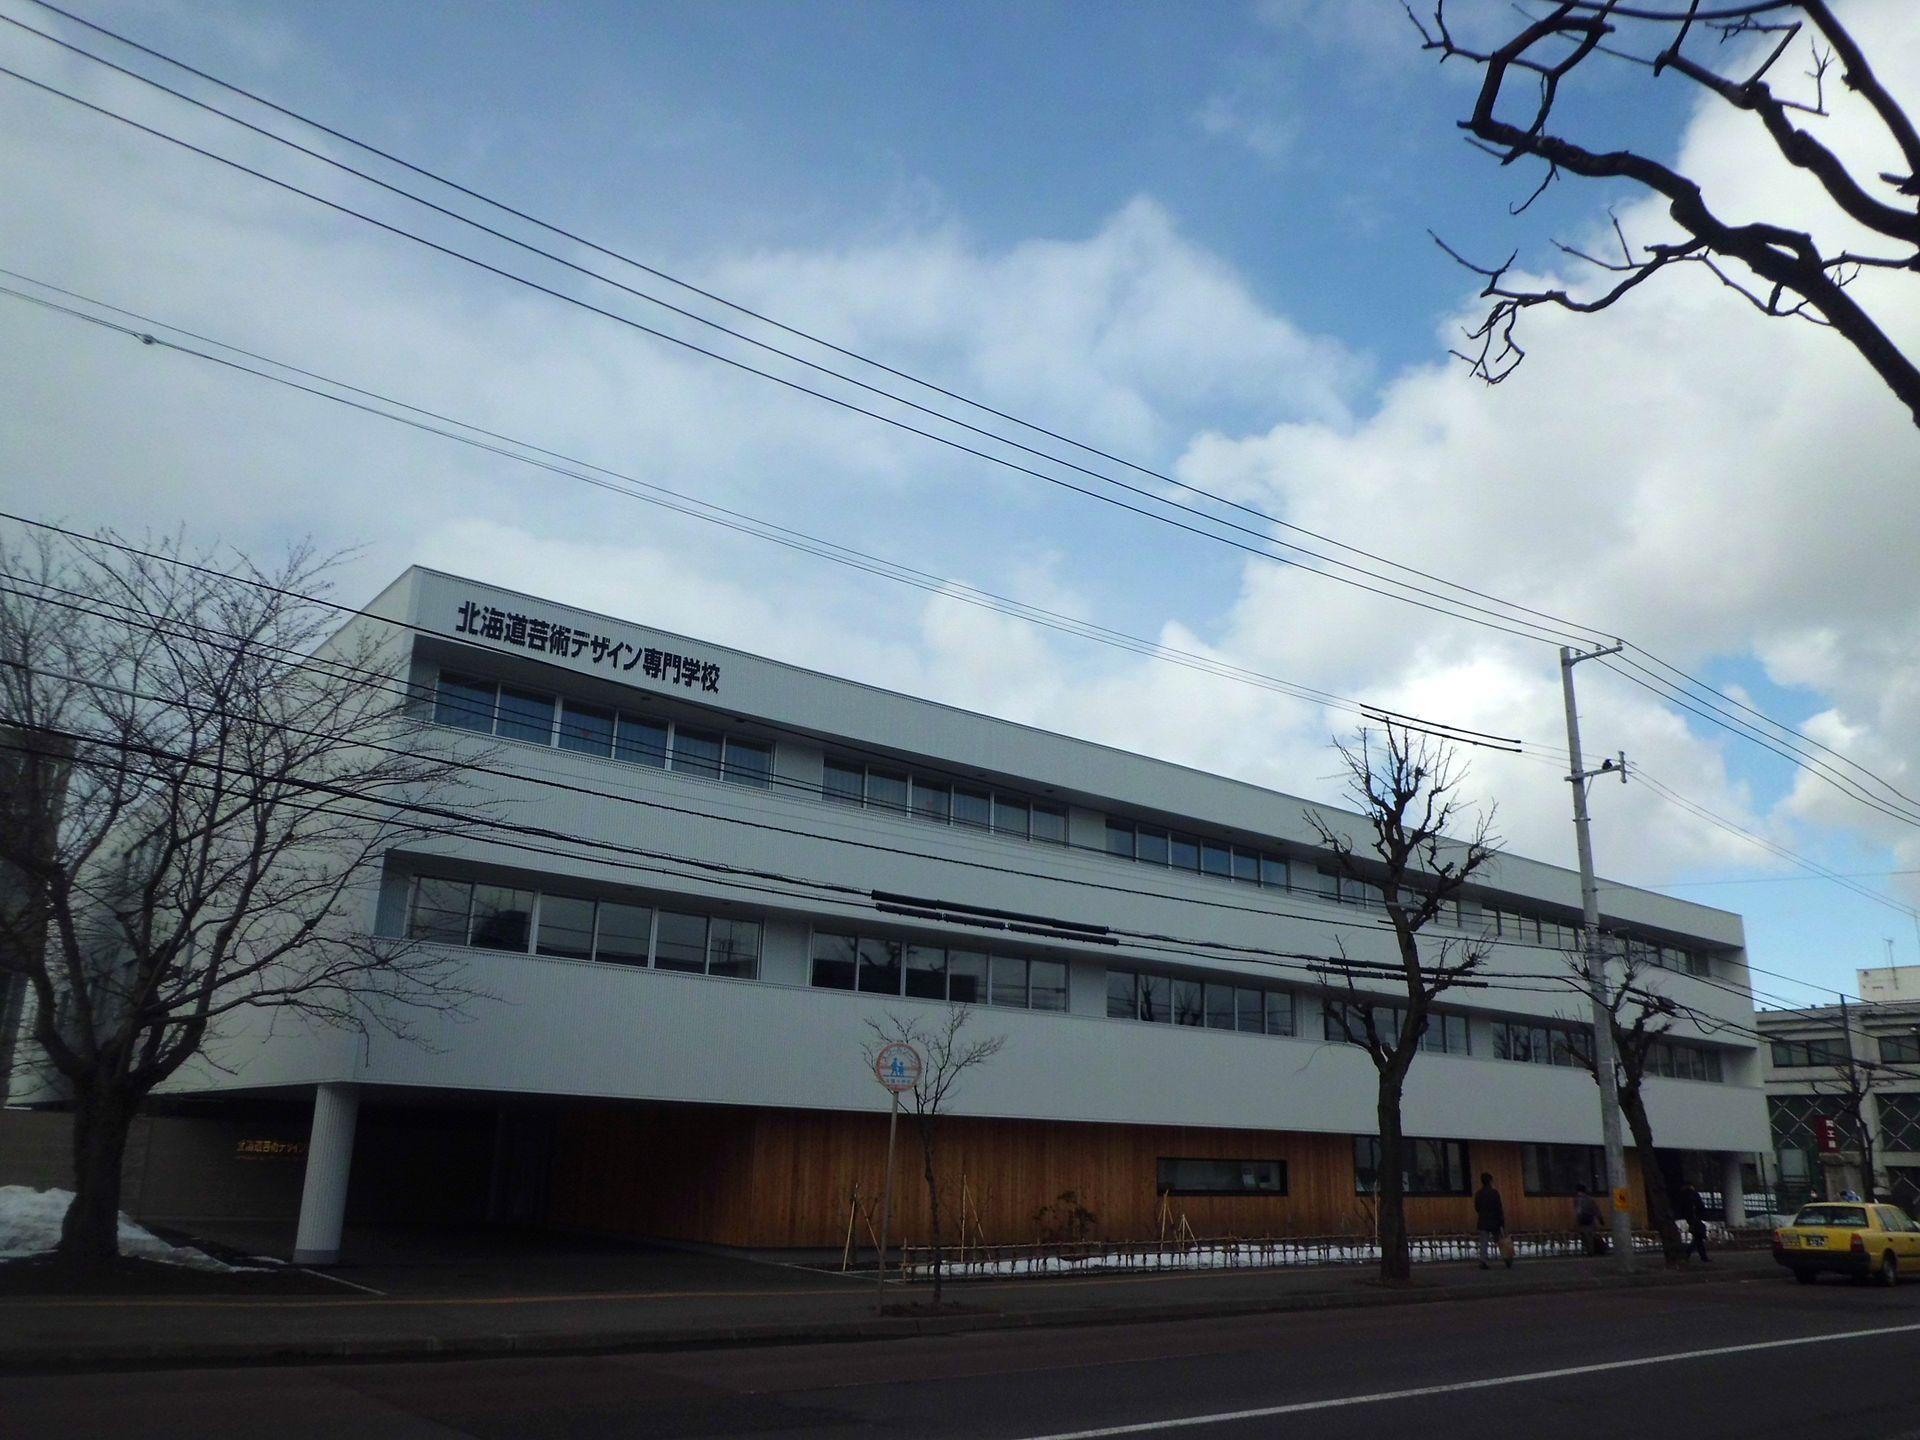 Mainline Art And Design : 北海道芸術デザイン専門学校 wikipedia